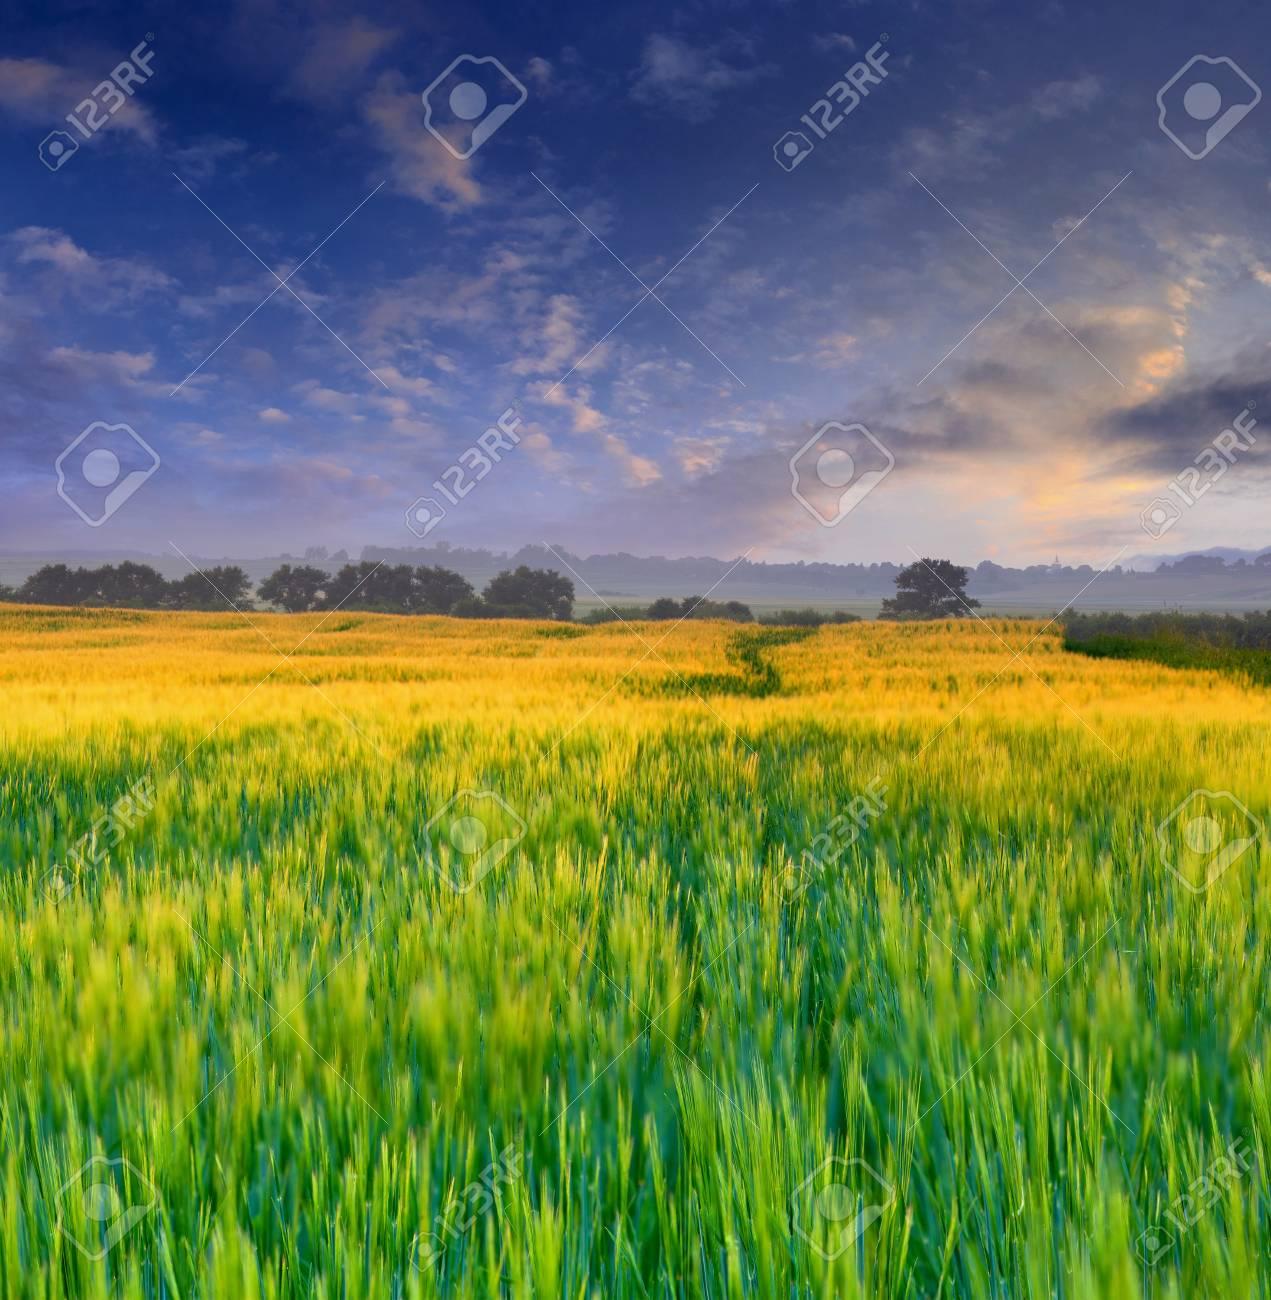 Wheat field at sunset Stock Photo - 13121274